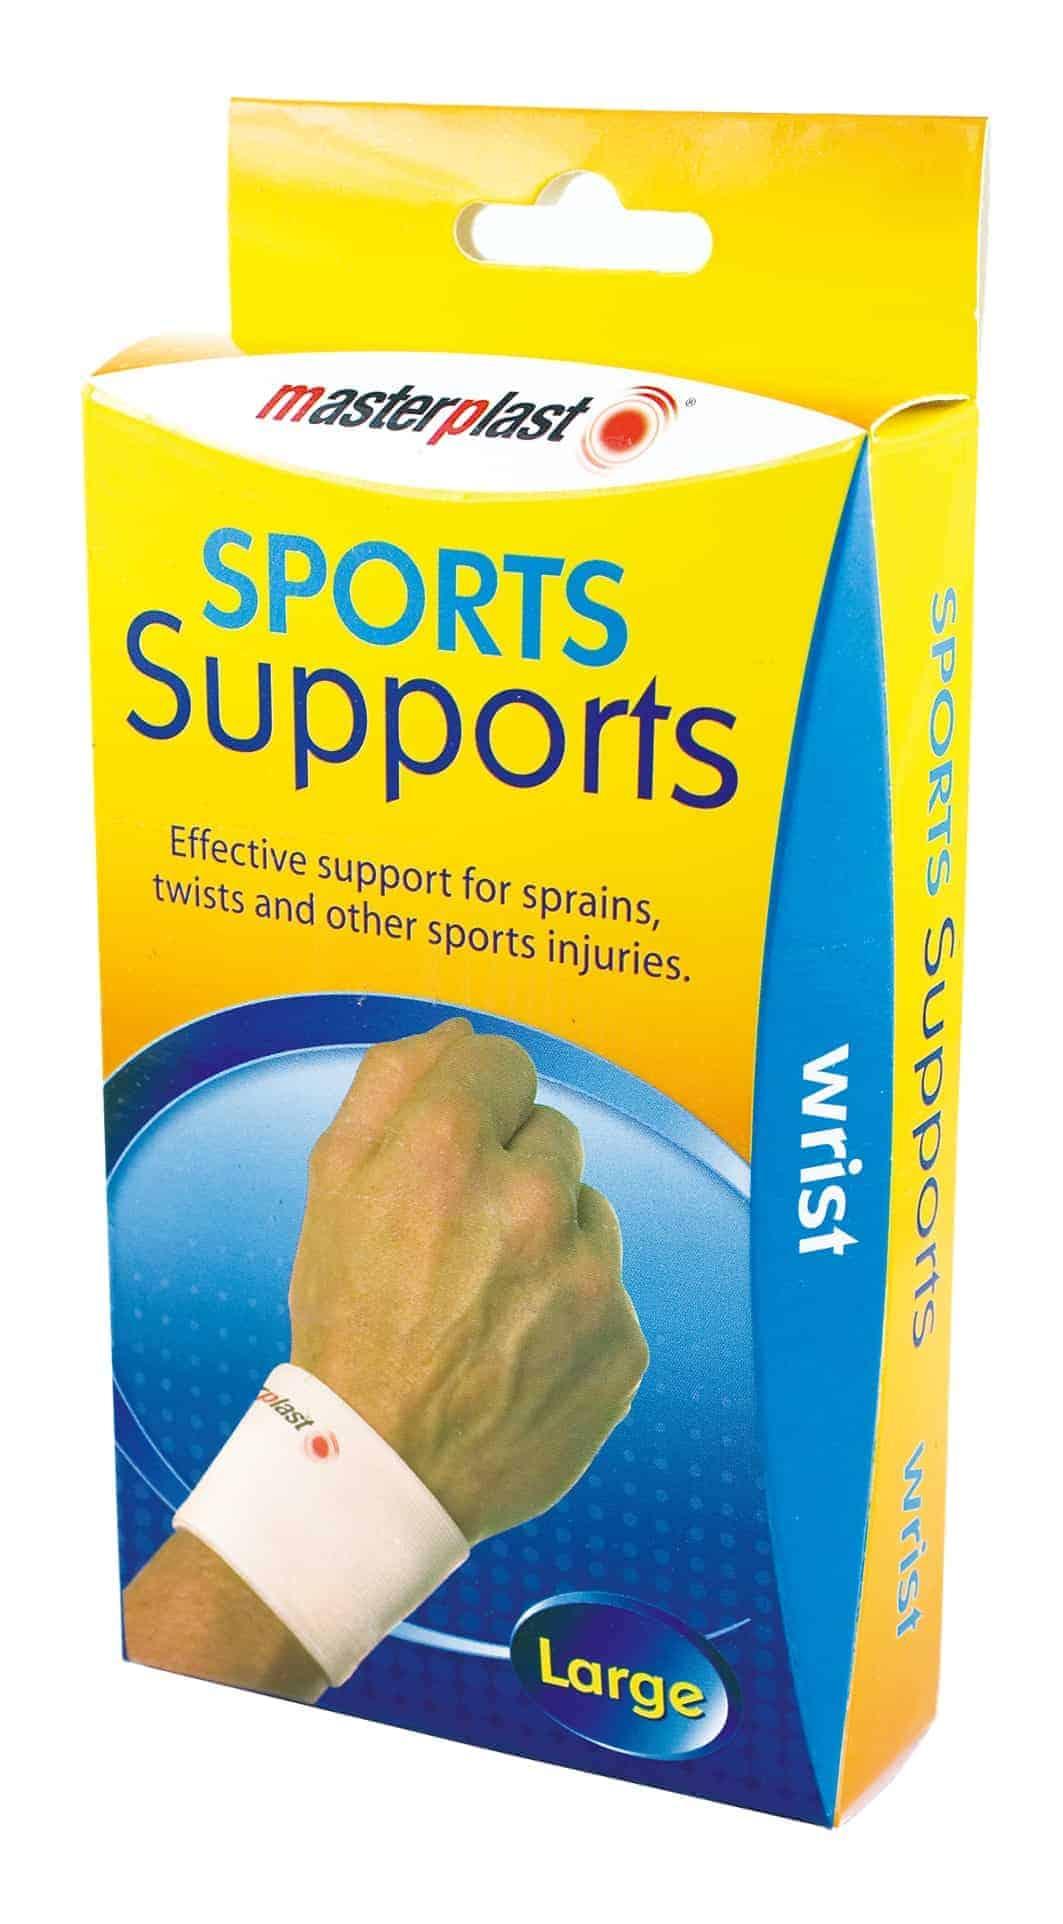 Master Plast Wrist Support